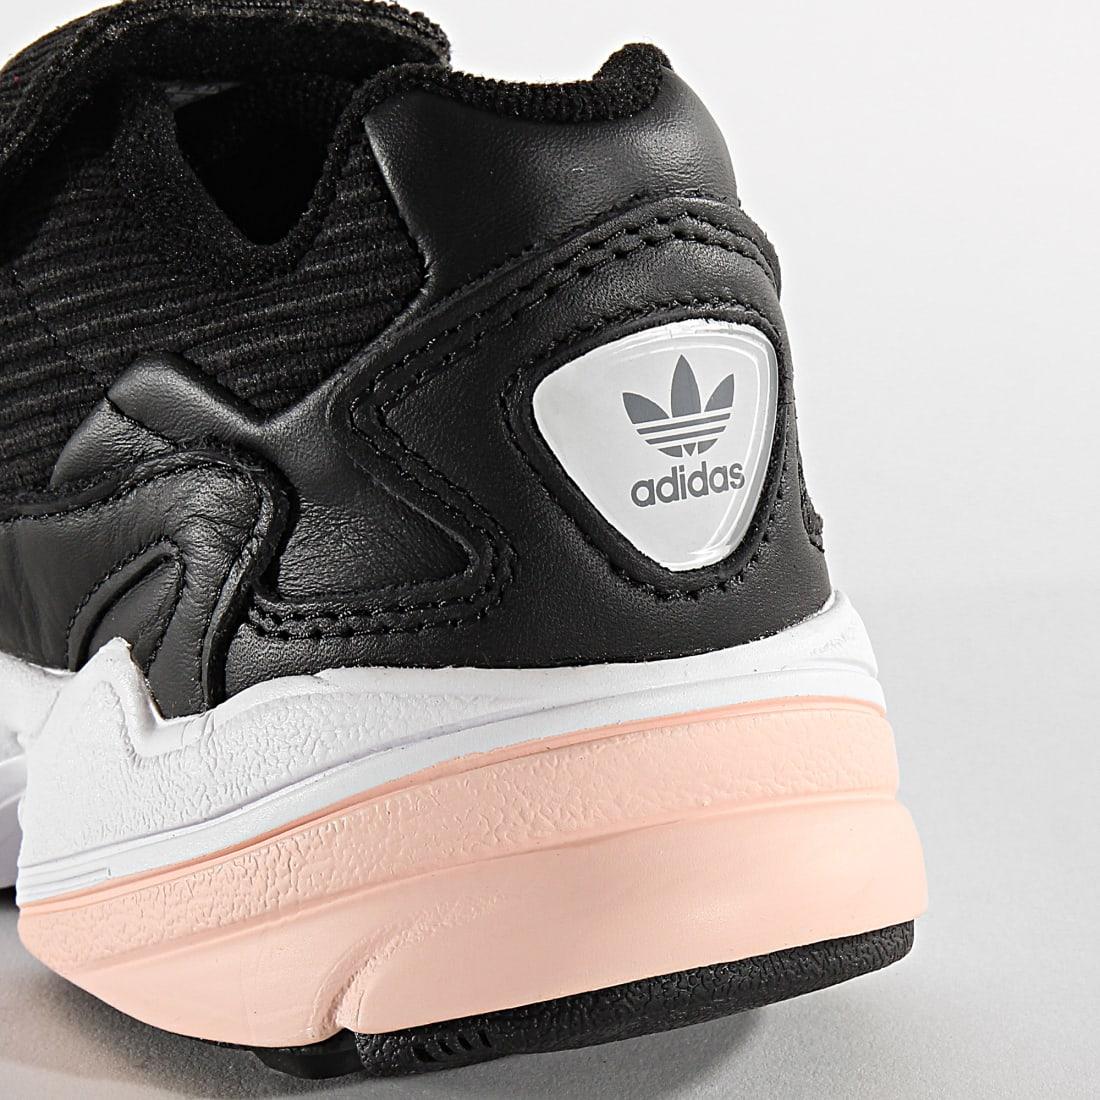 adidas Baskets Femme Falcon RX EE5112 Core Black Glow Pink